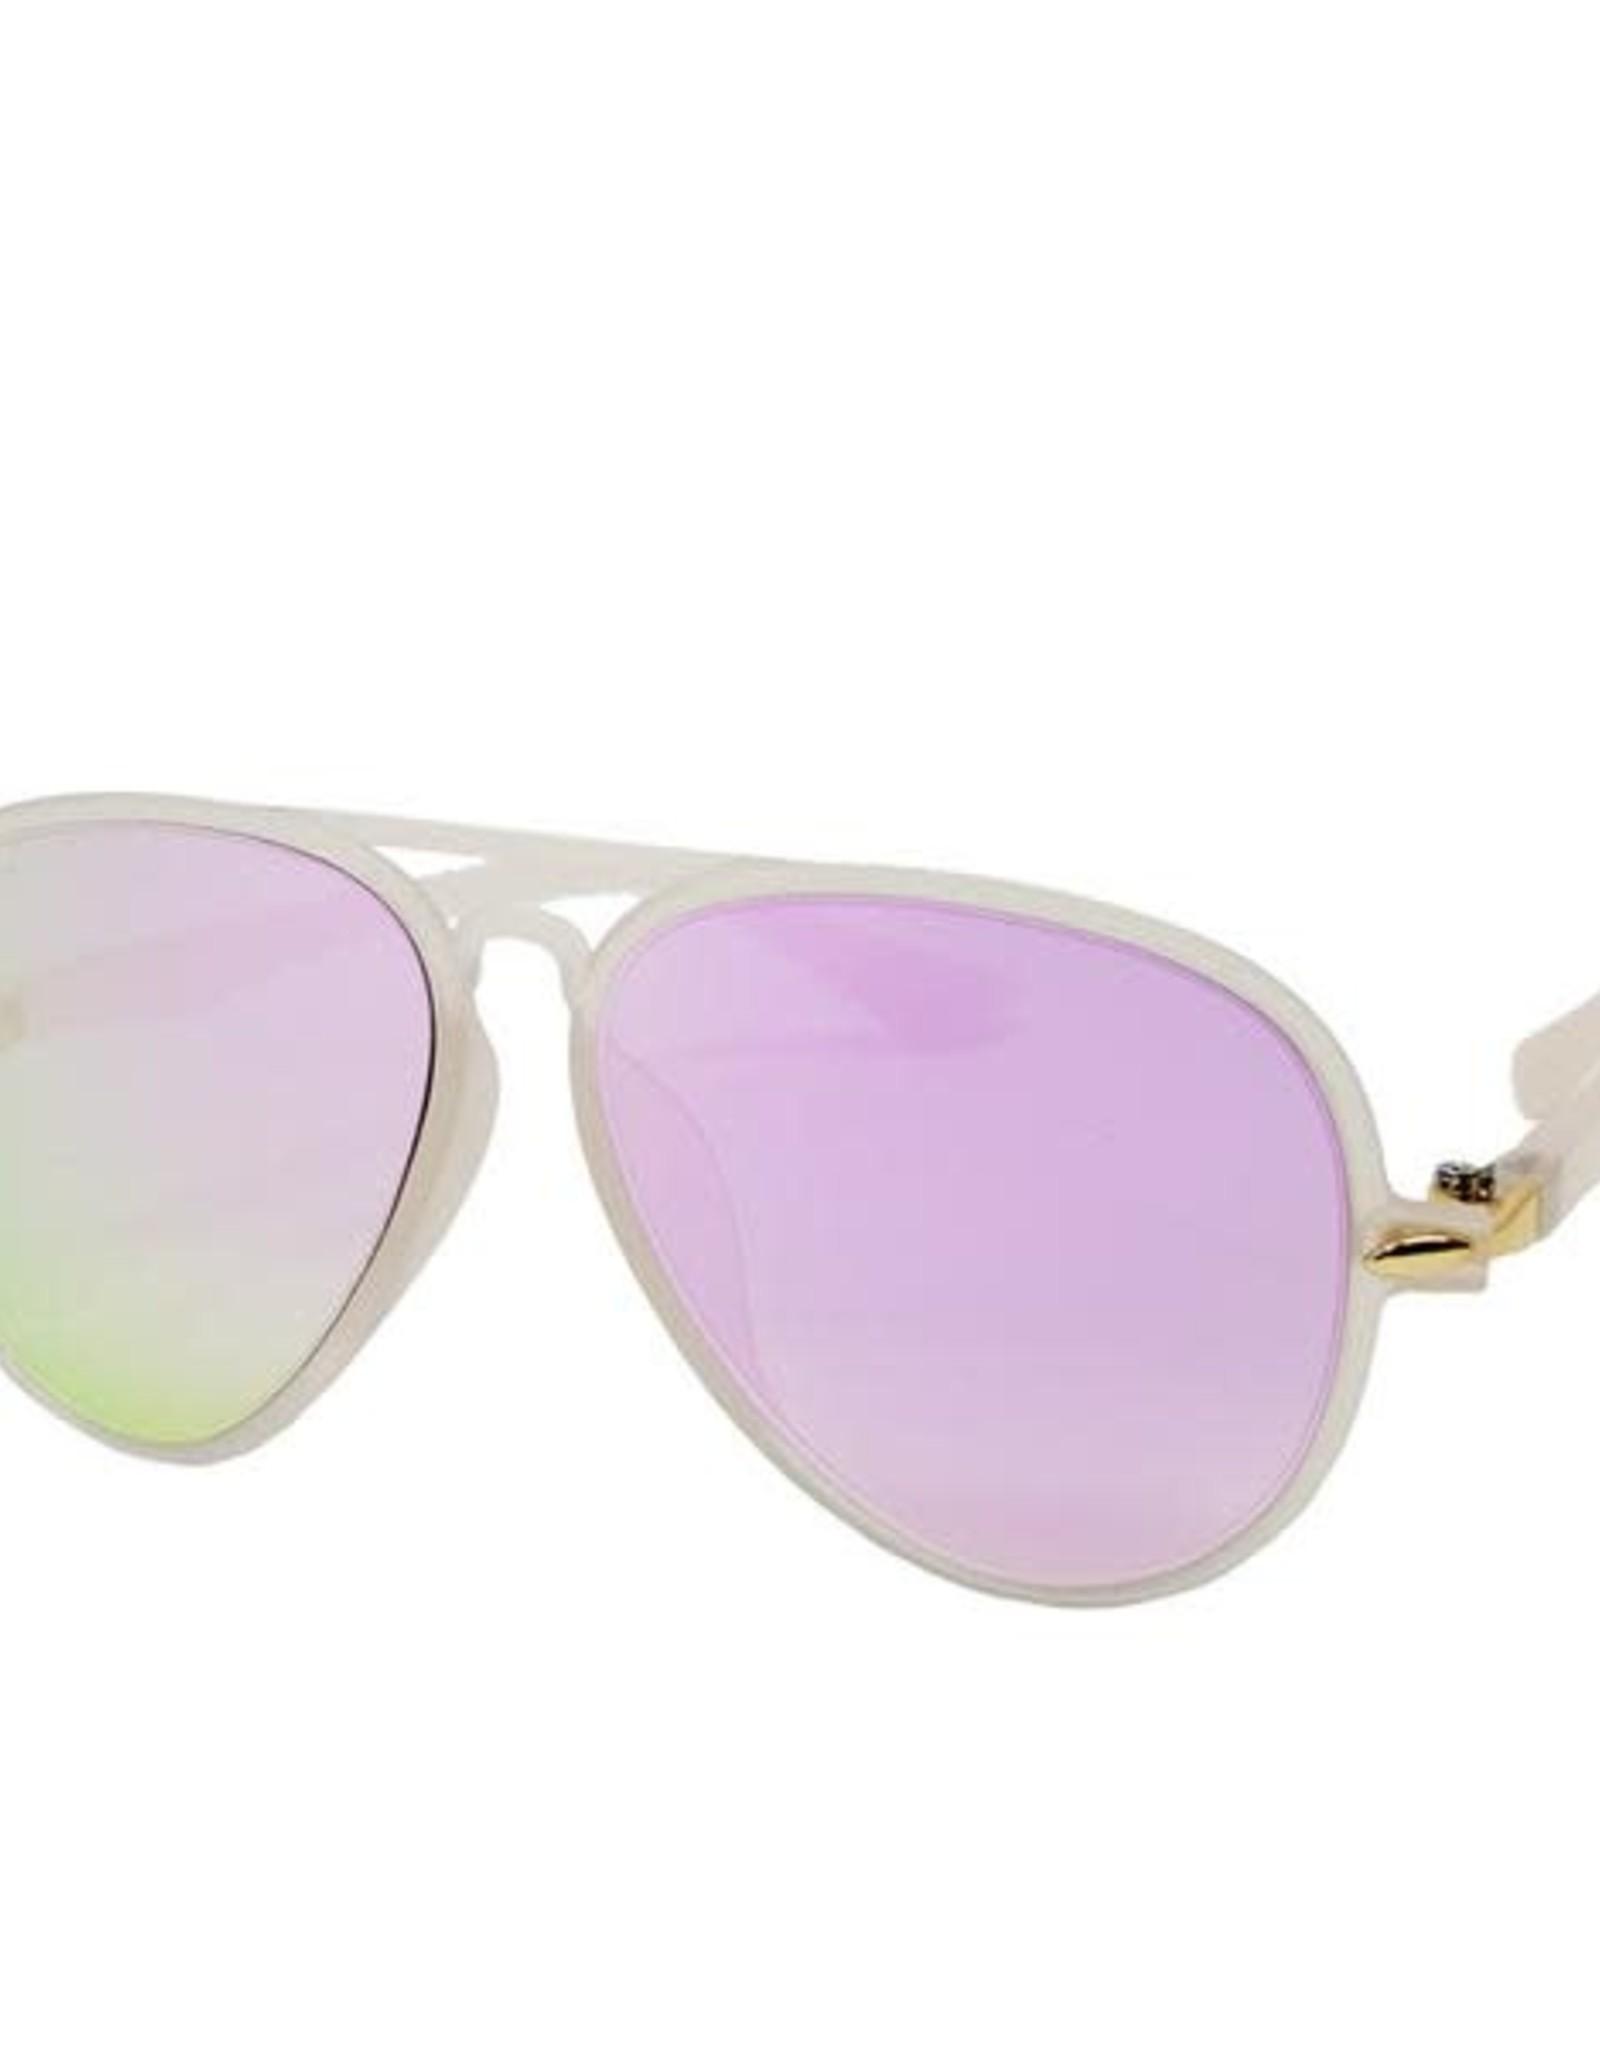 Zomi Gems Light Pink Aviator Sunglasses